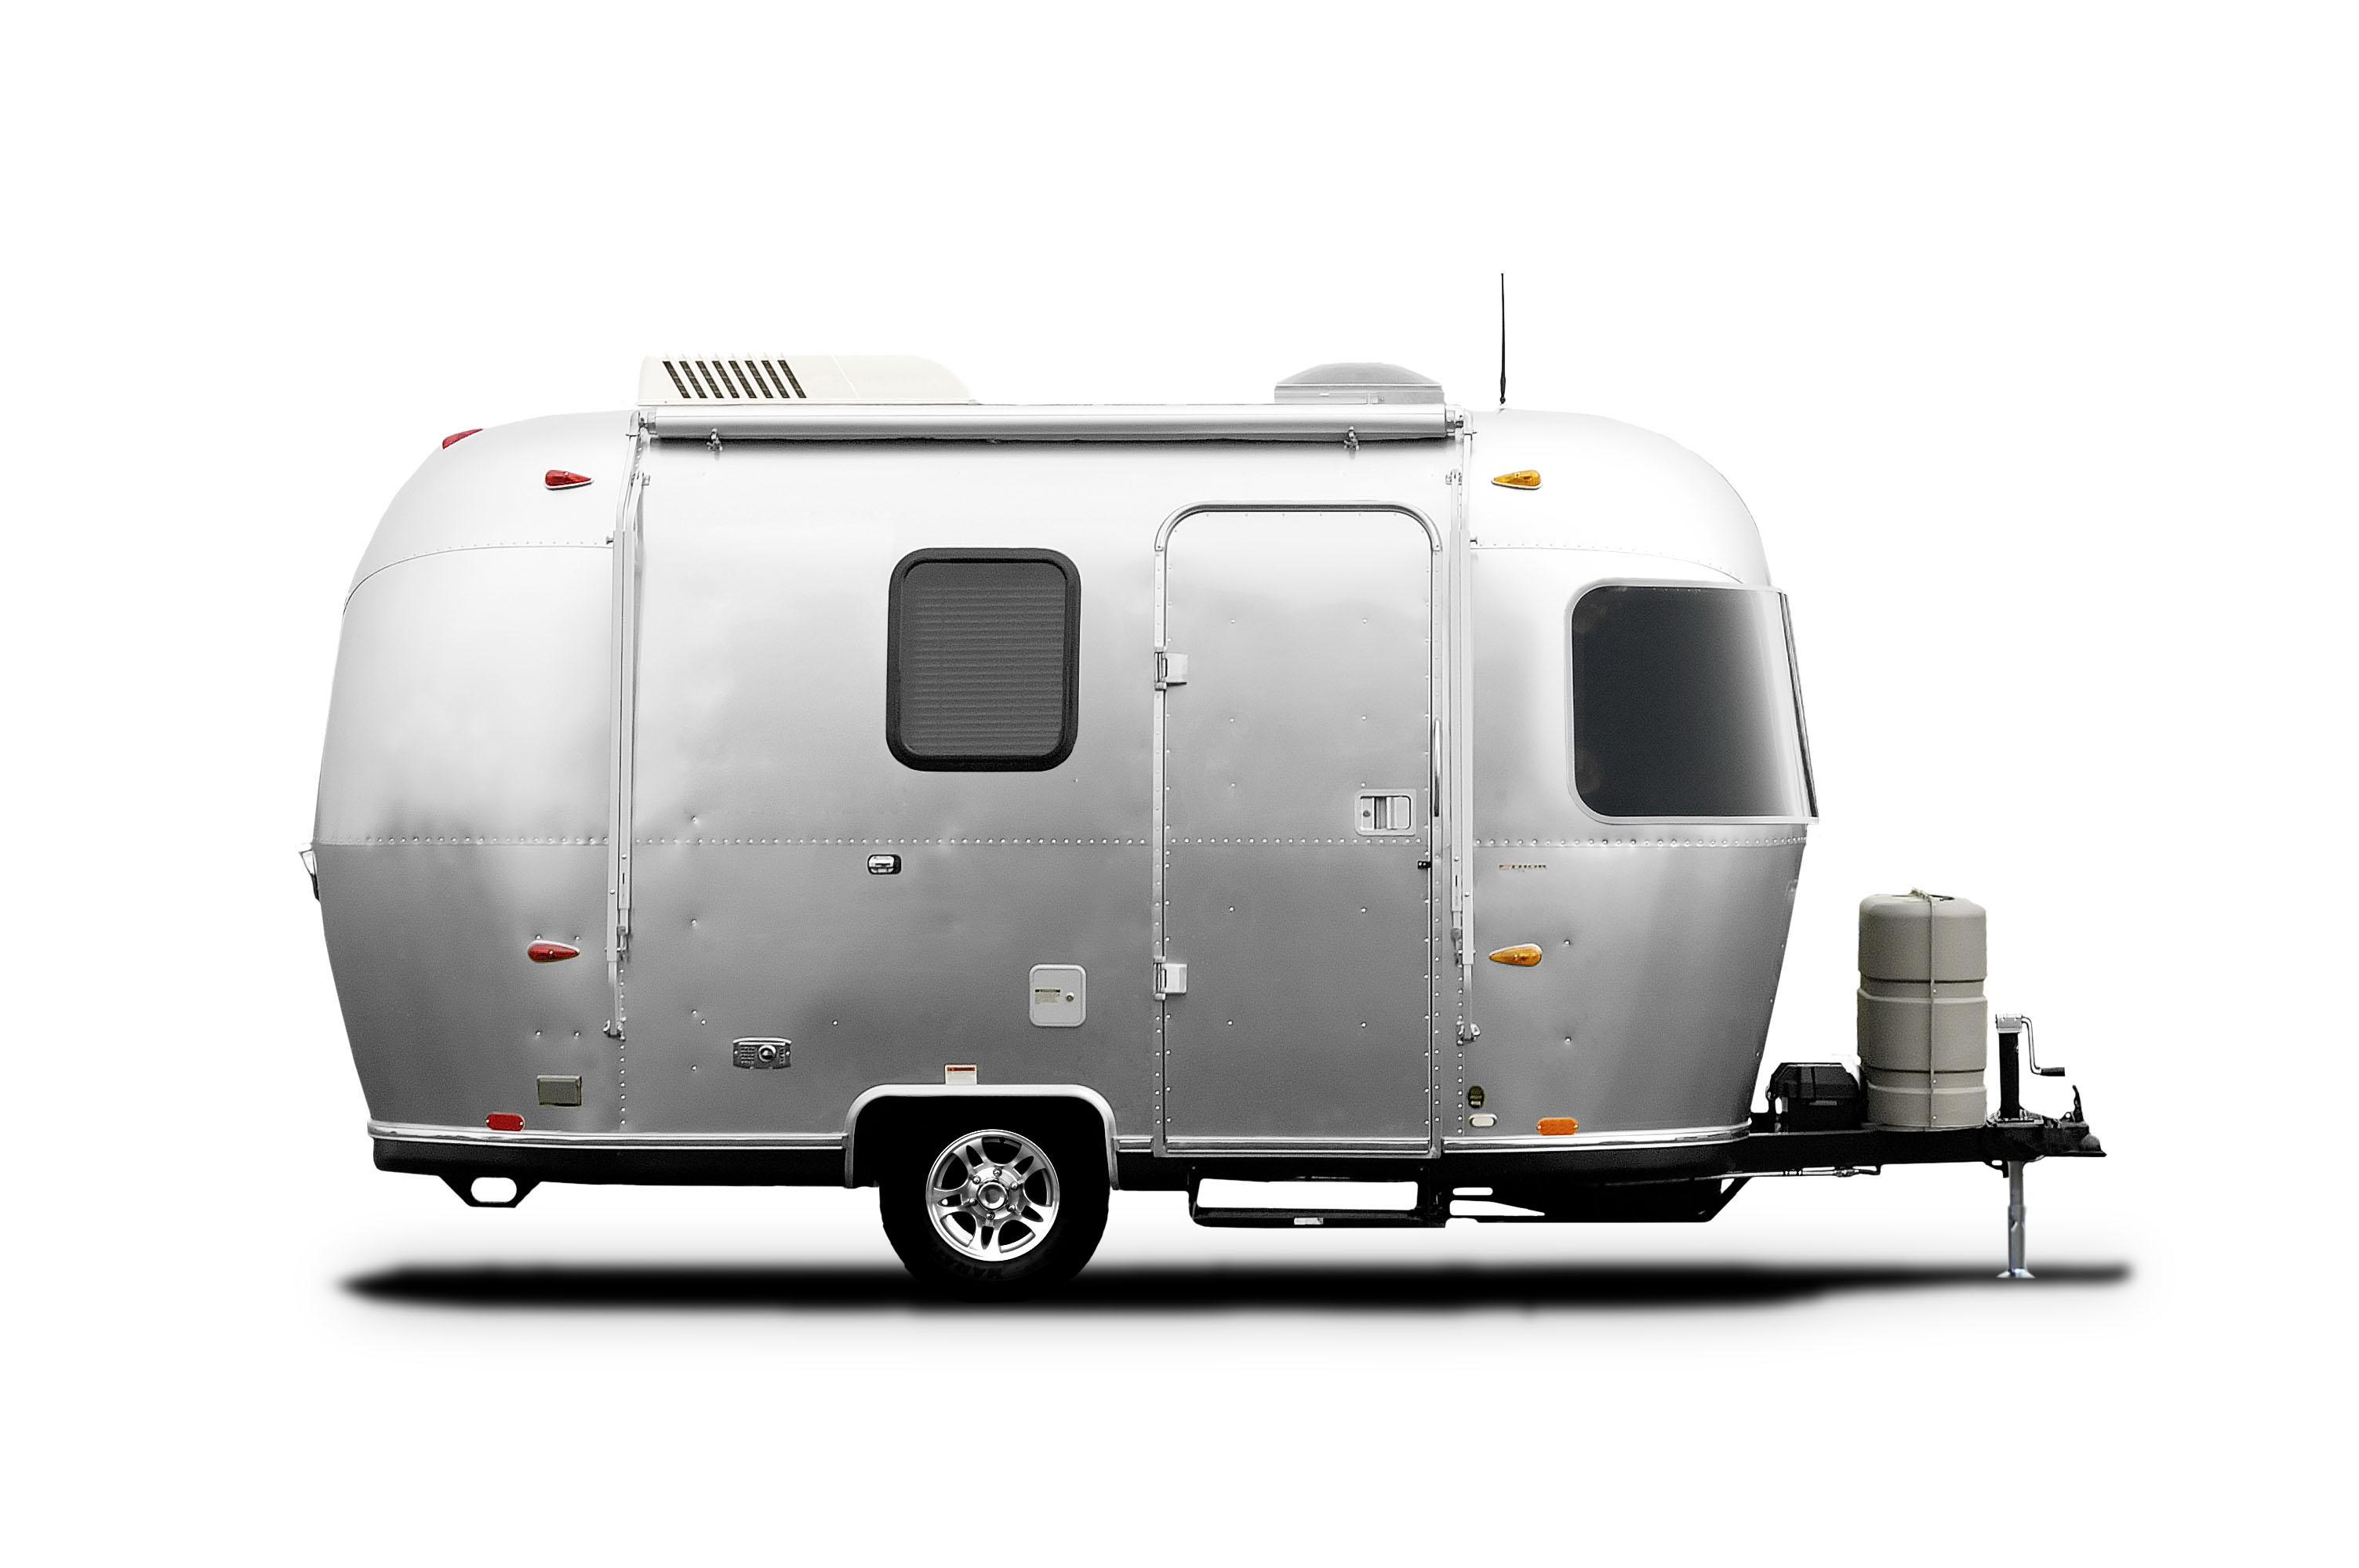 Airstream Stories | Travel Trailer Adventures | Models